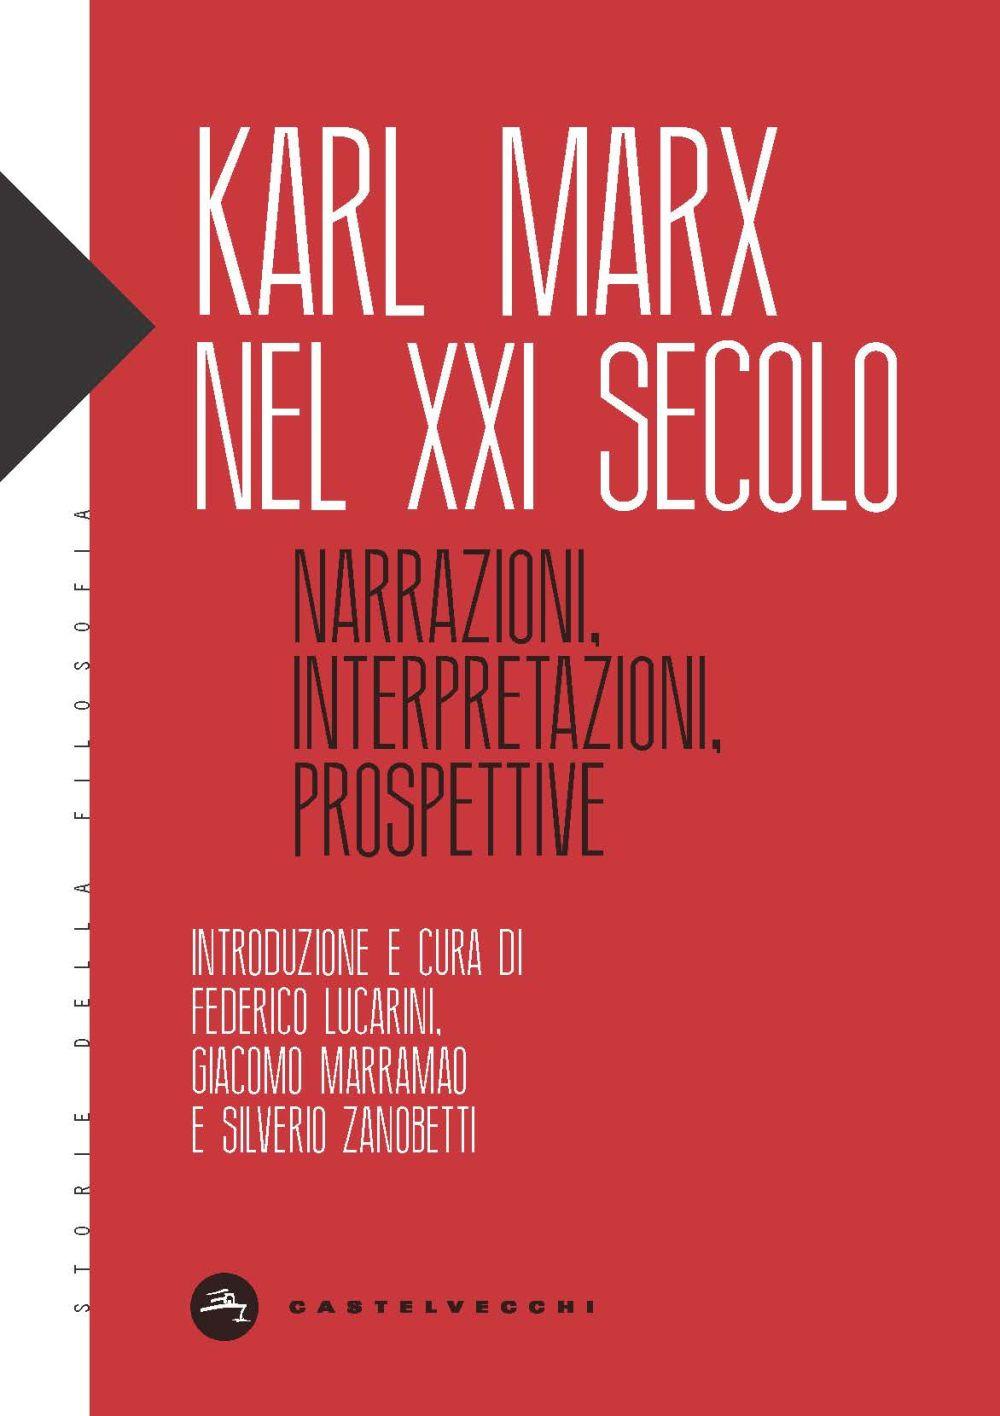 KARL MARX NEL XXI SECOLO - Maffettone Sebastiano - 9788832901771